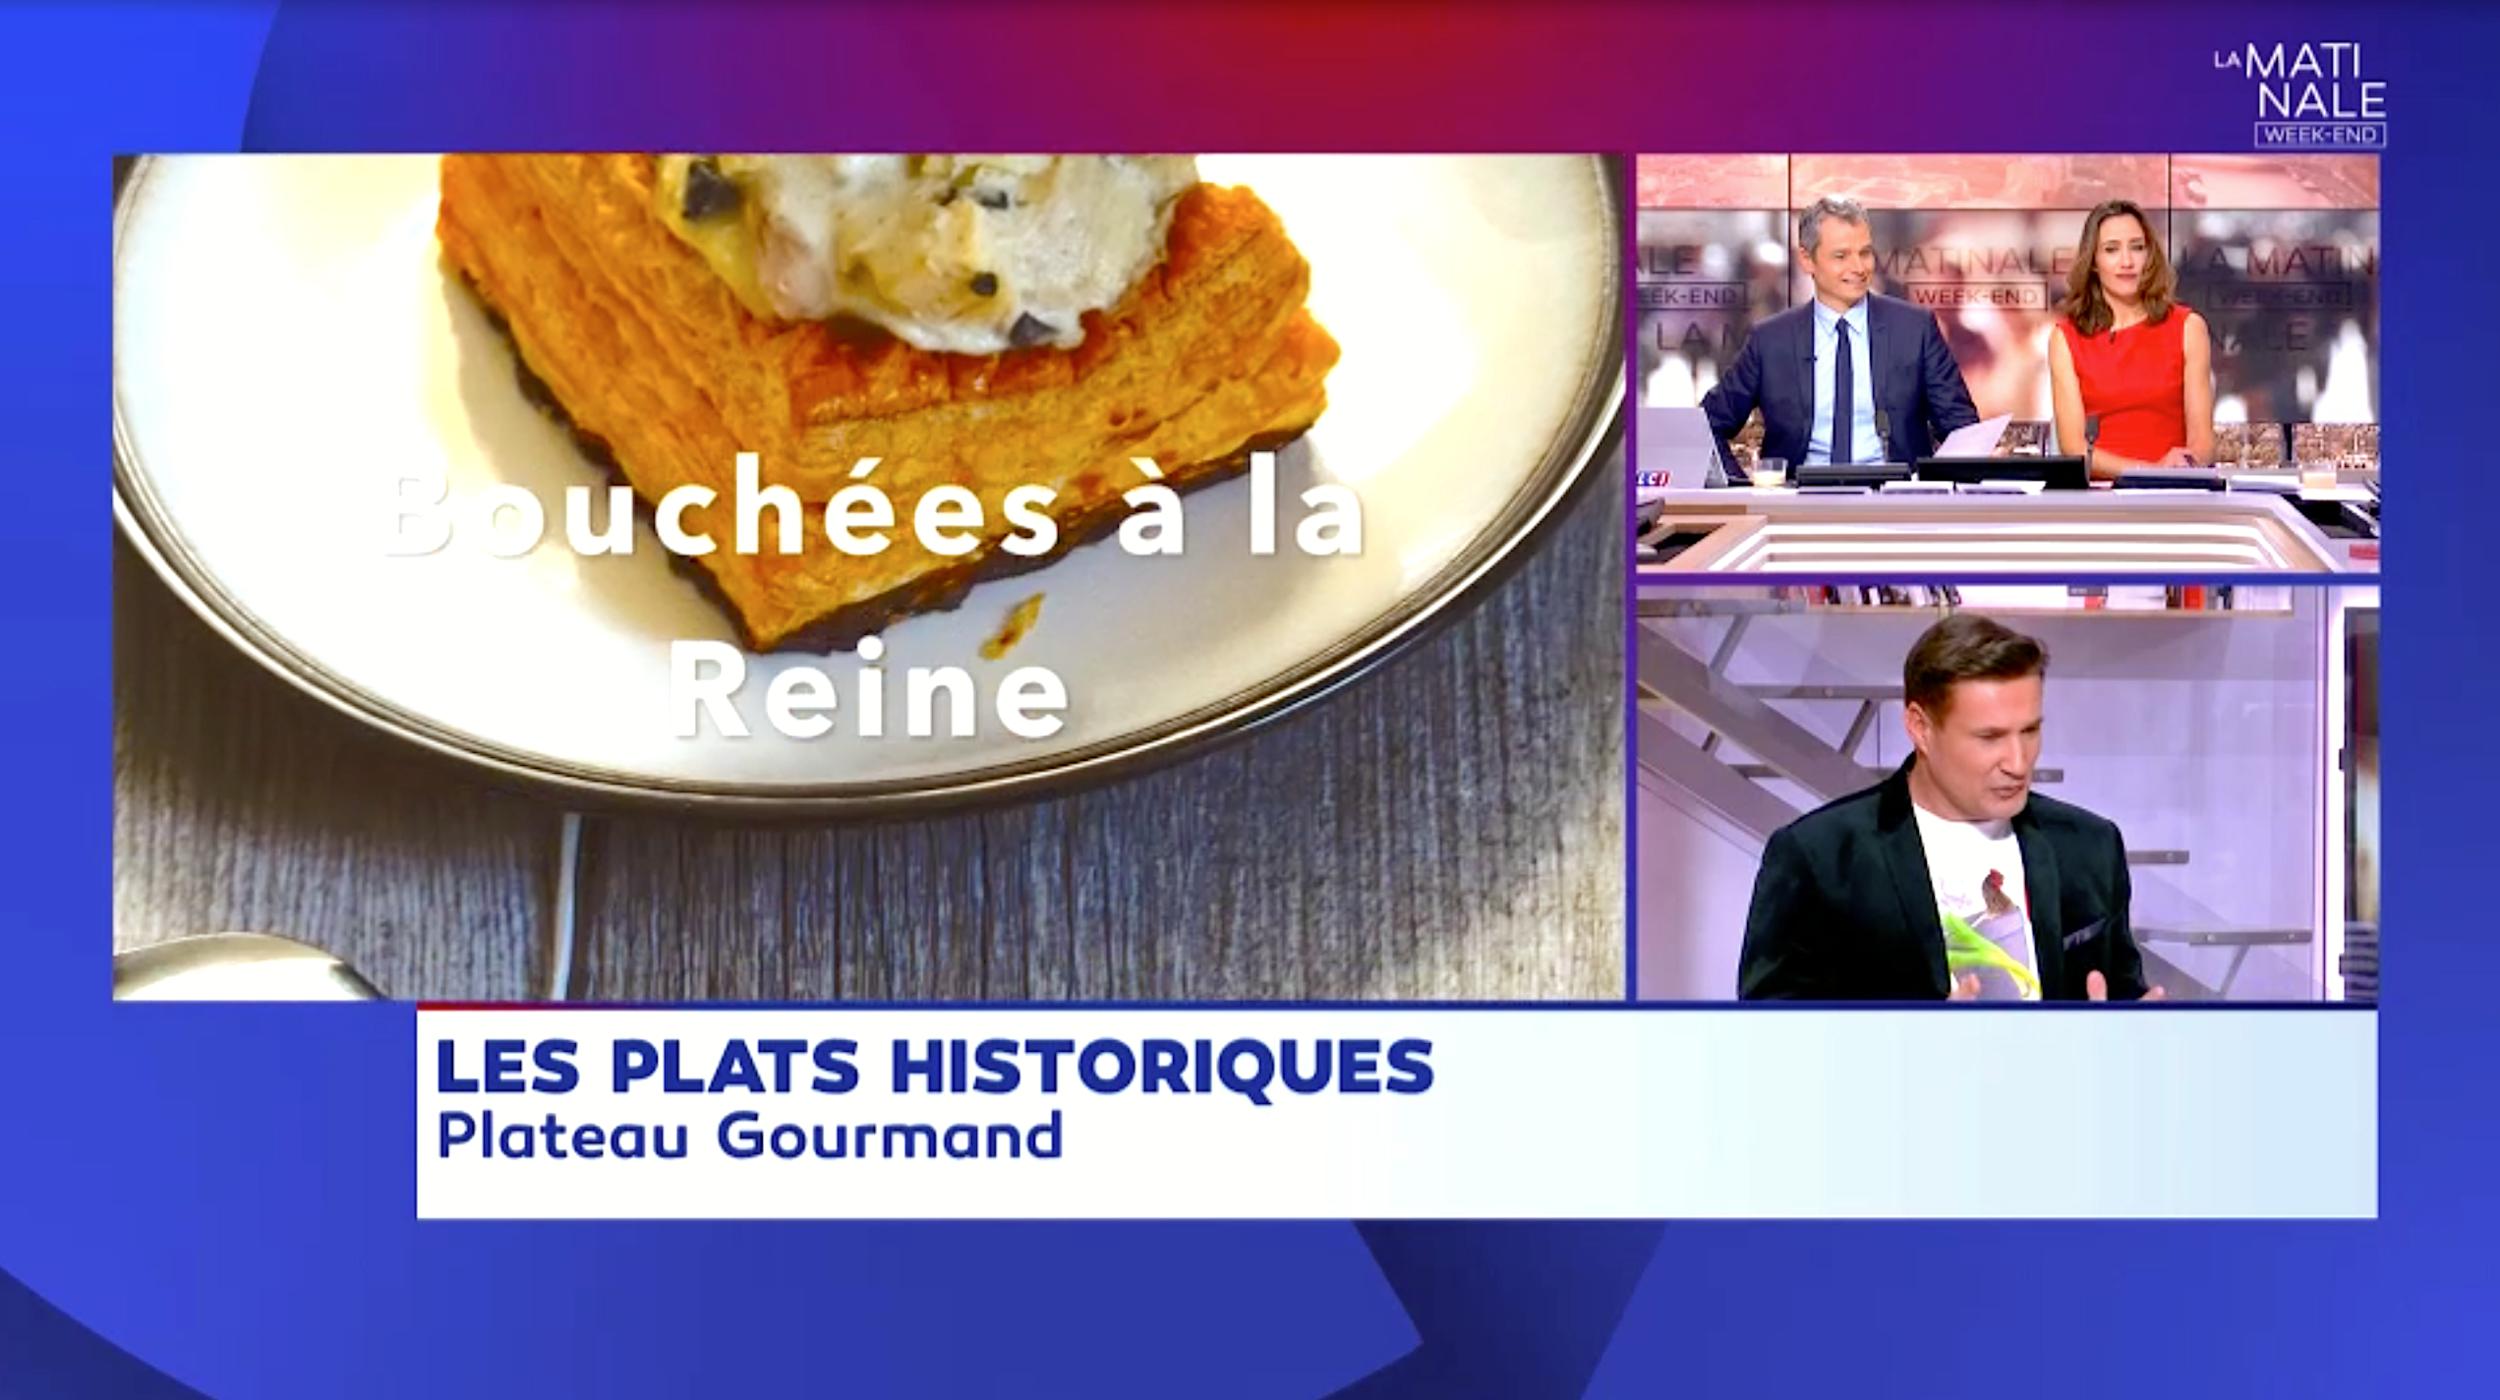 http://www.lci.fr/replay/plateau-gourmand-du-11-novembre-avec-cyril-rouquet-prevost-2070157.html